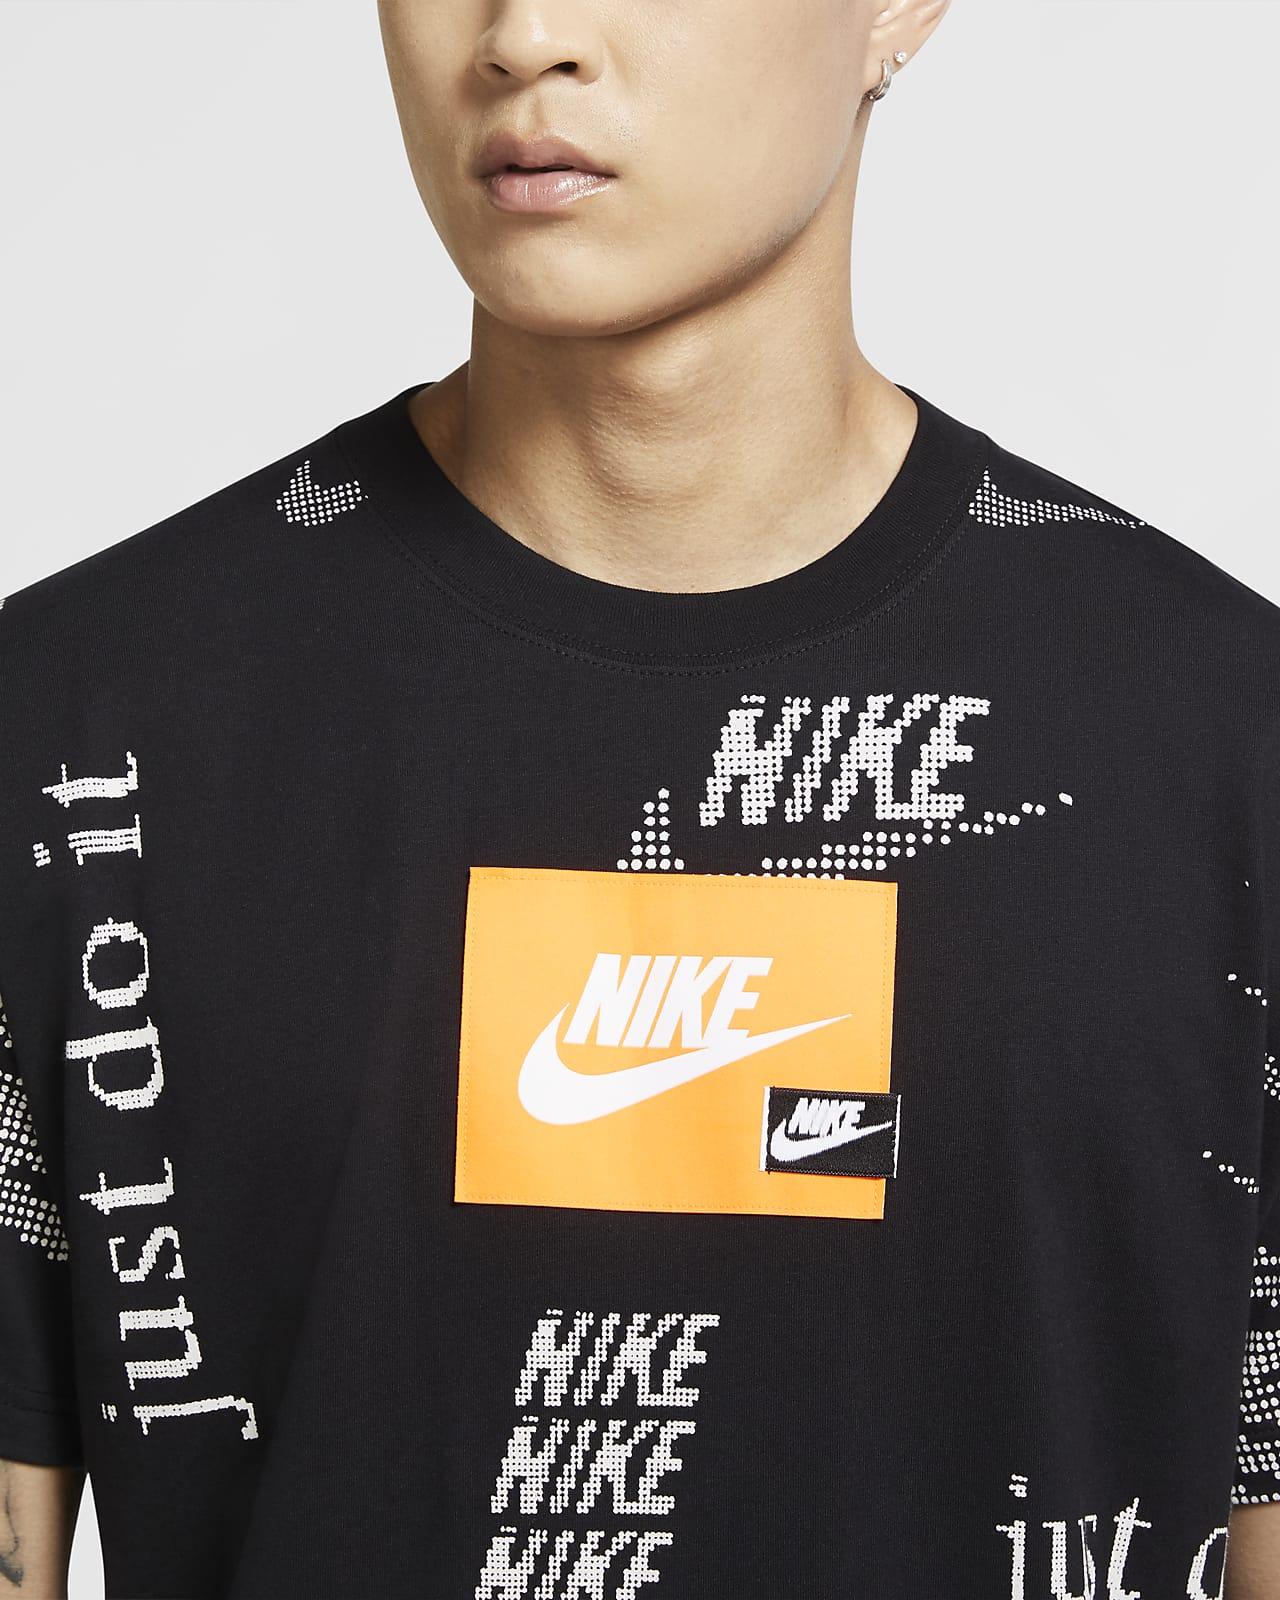 T-shirt NIKE NK CJ5336-010 Tshirt Herren LangarT Shirt Sport